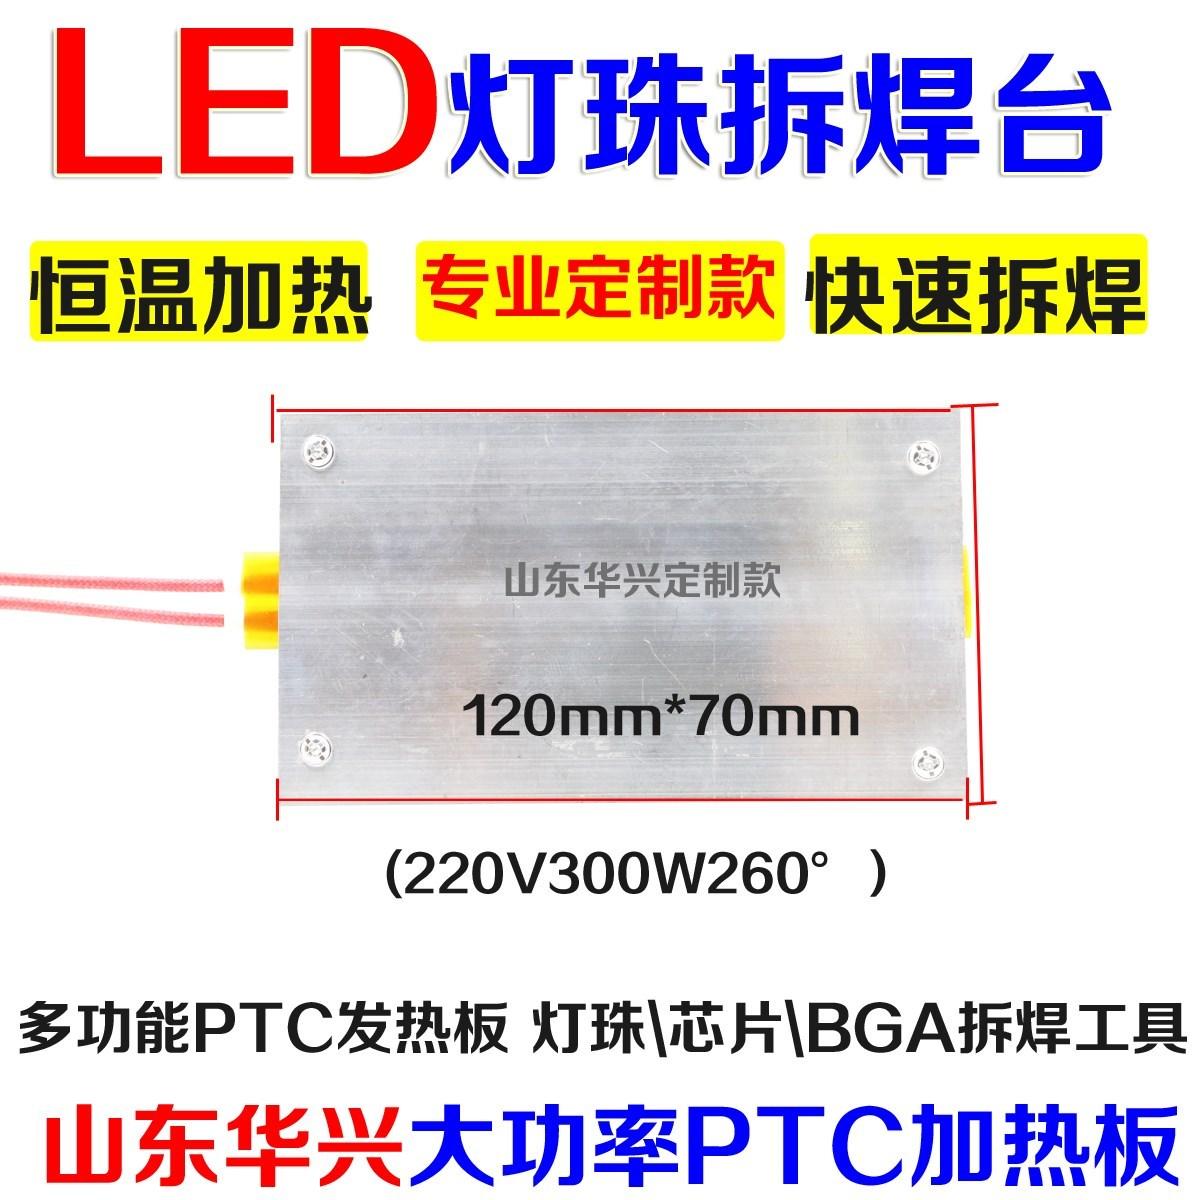 led灯珠拆焊台 PTC发热板 贴片BGA芯片拆焊台大功率电路板发热片